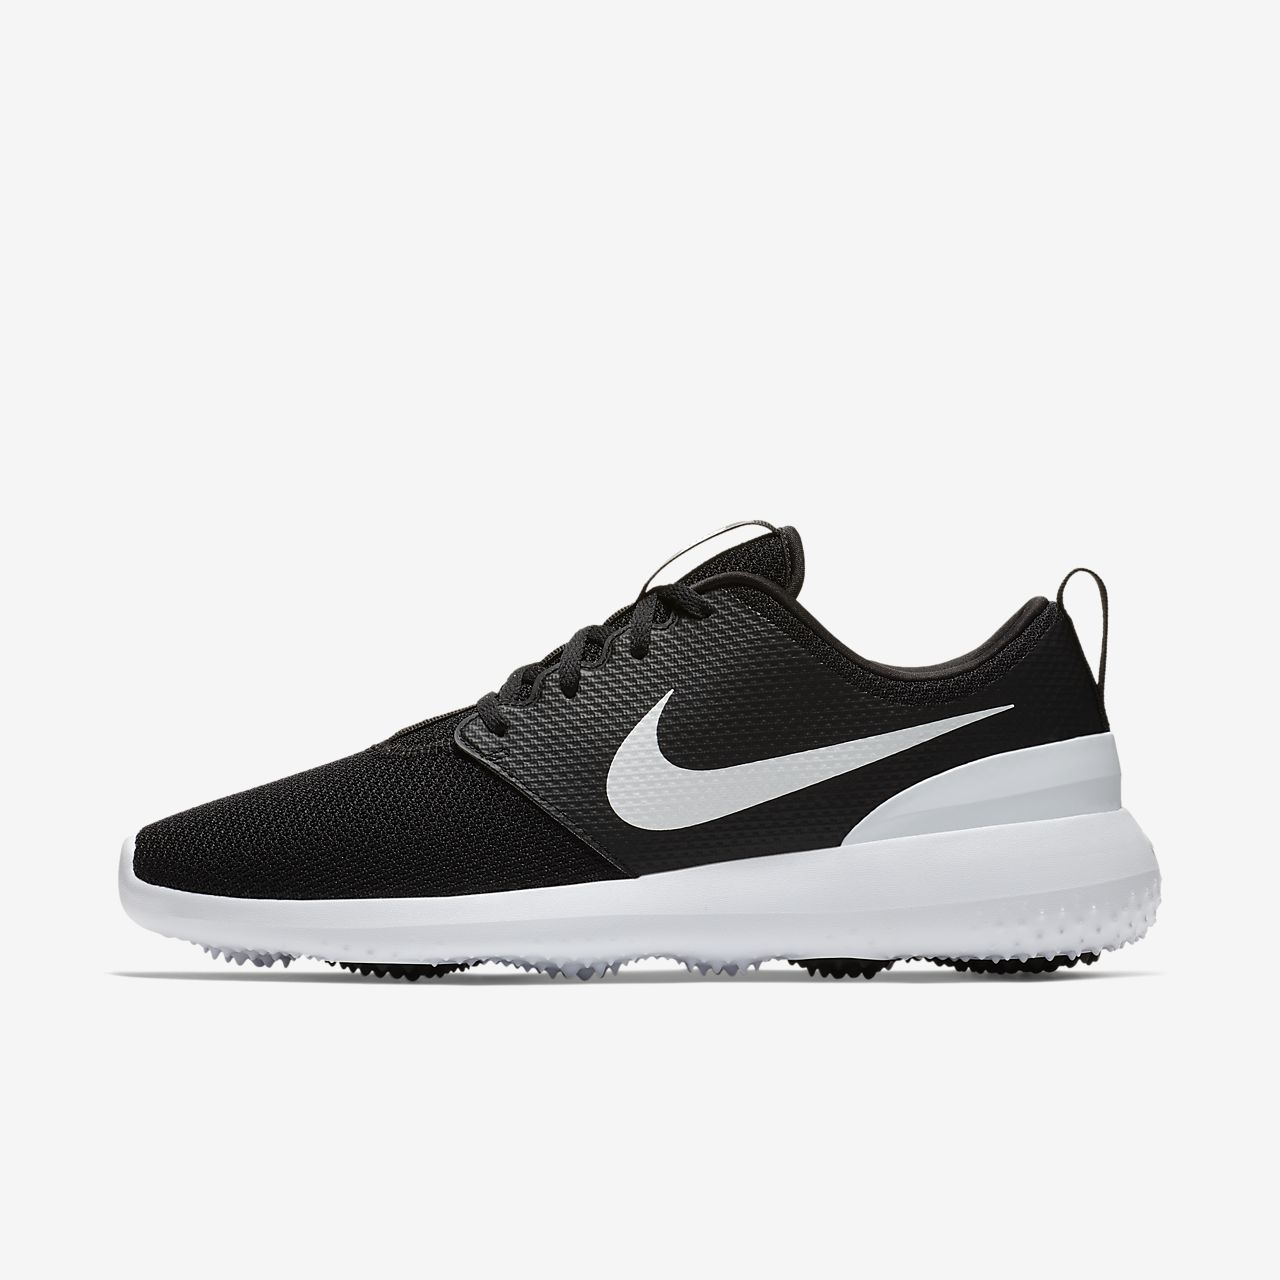 outlet store f911a 6d7e6 ... Nike Roshe G Men s Golf Shoe